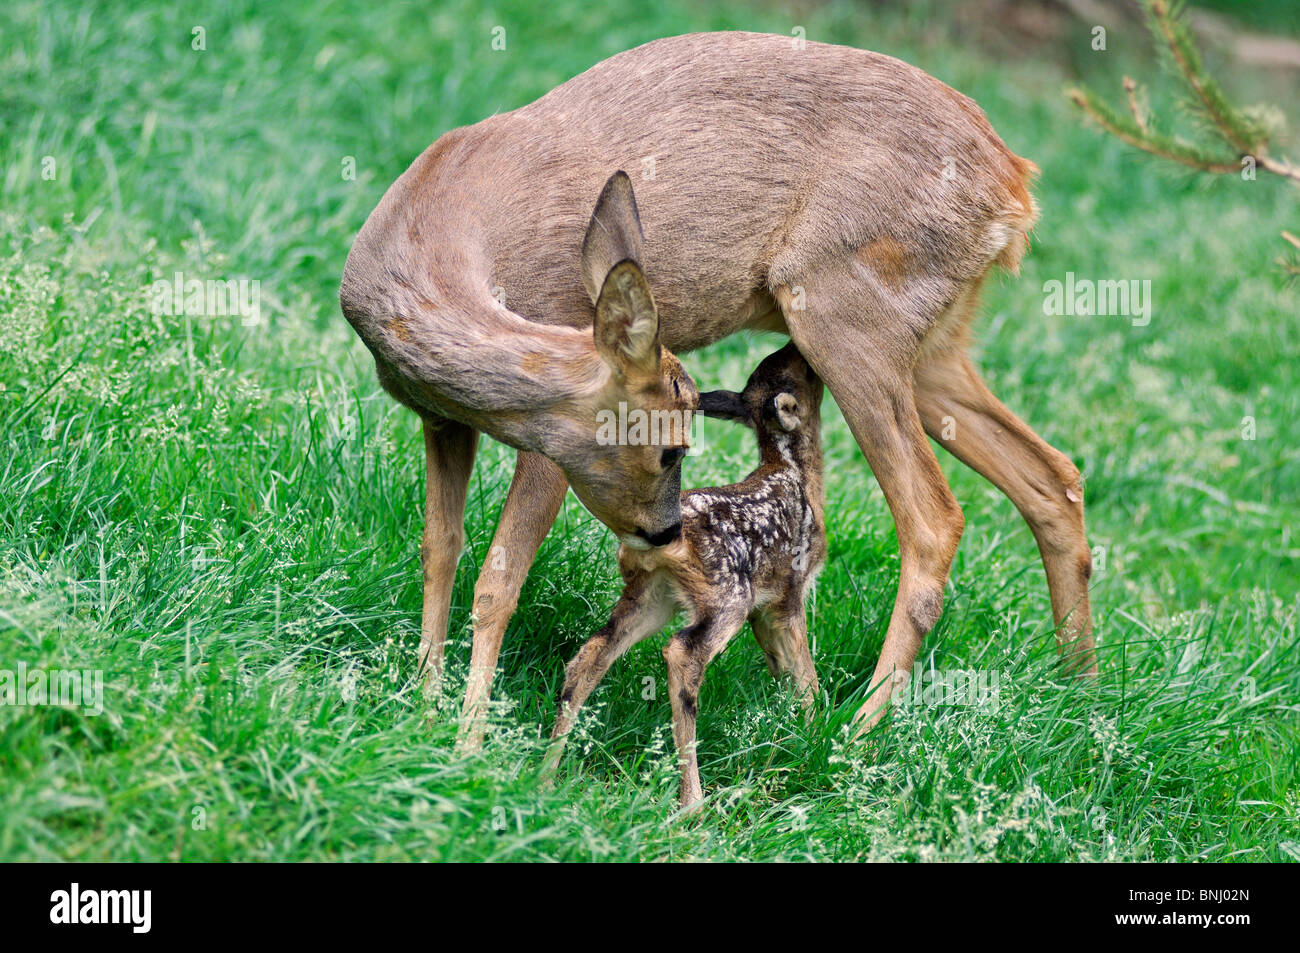 Europaean Roe Deer Calf Fawn Capreolus Capreolus Animal Animals Young Stock Photo